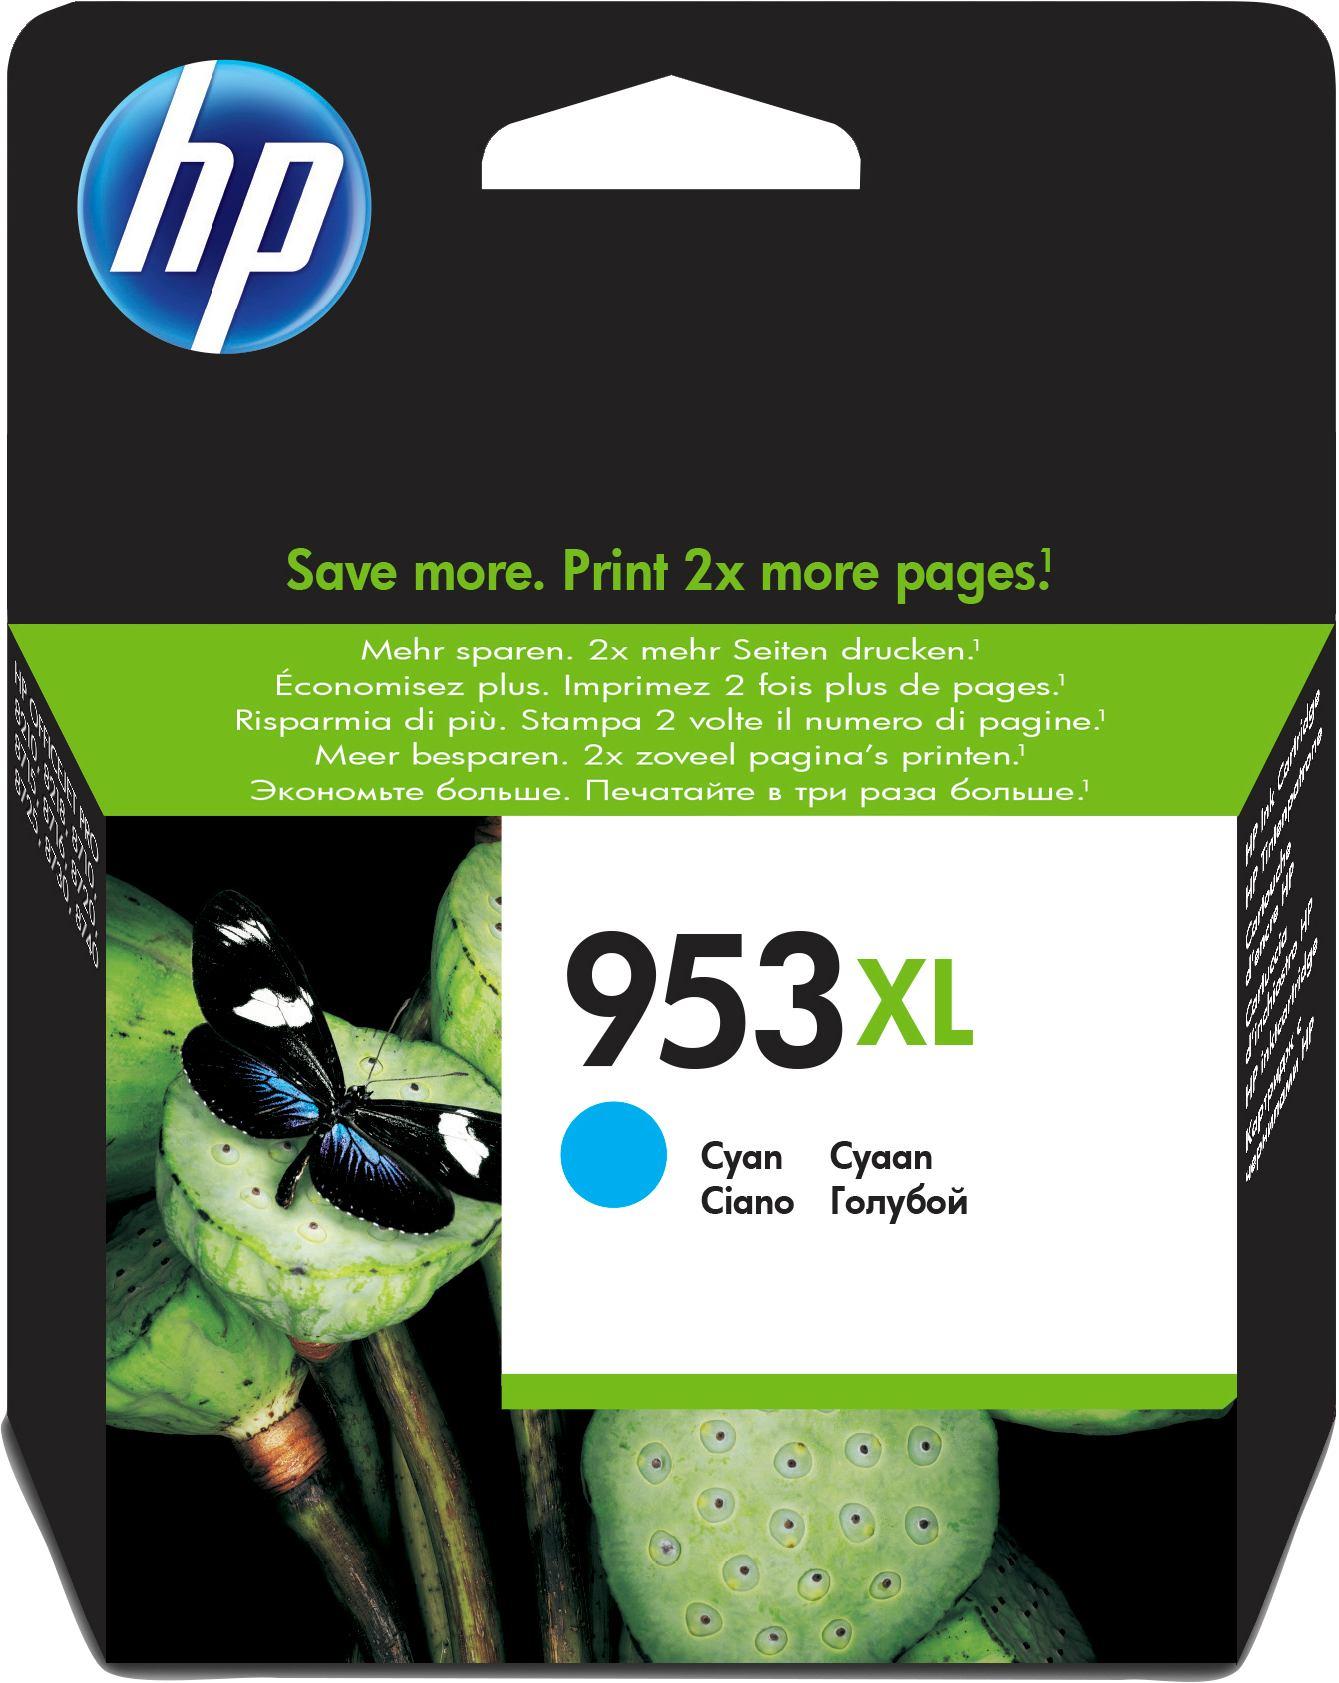 2073695-HP-953XL-Originale-Ciano-Tinte-HP-OfficeJet-Pro-8700-953XL-CYAN